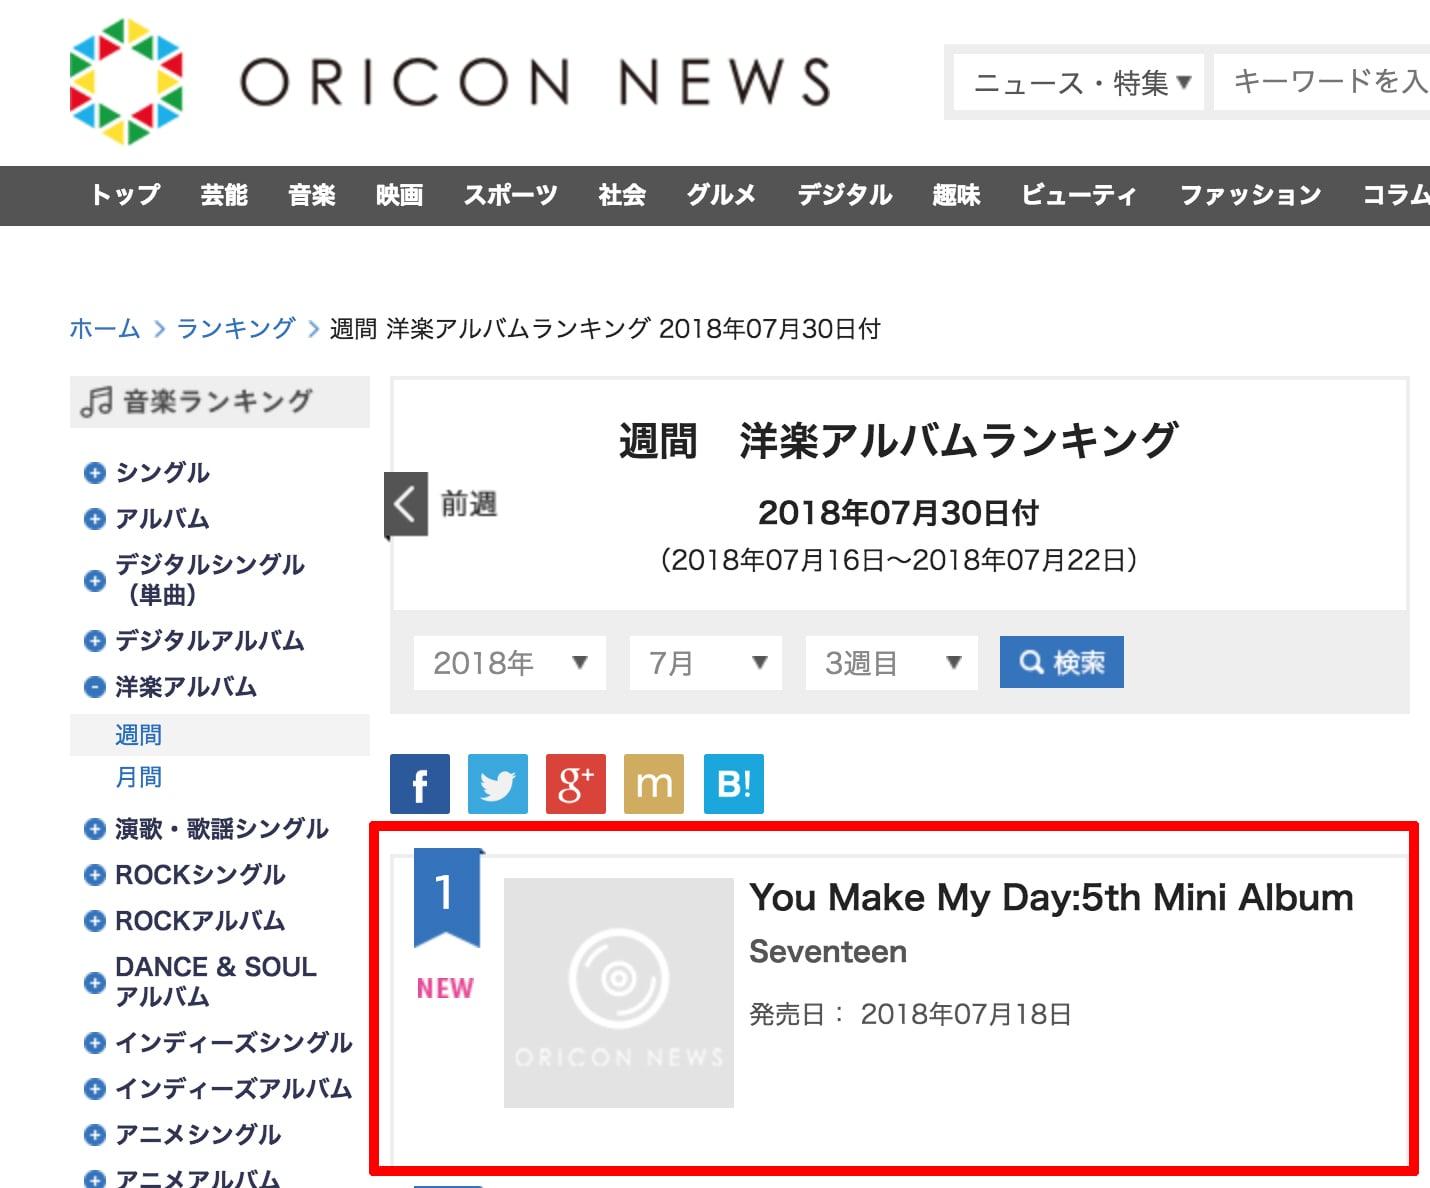 SEVENTEEN Impresses On Oricon's Weekly Album Charts | Soompi